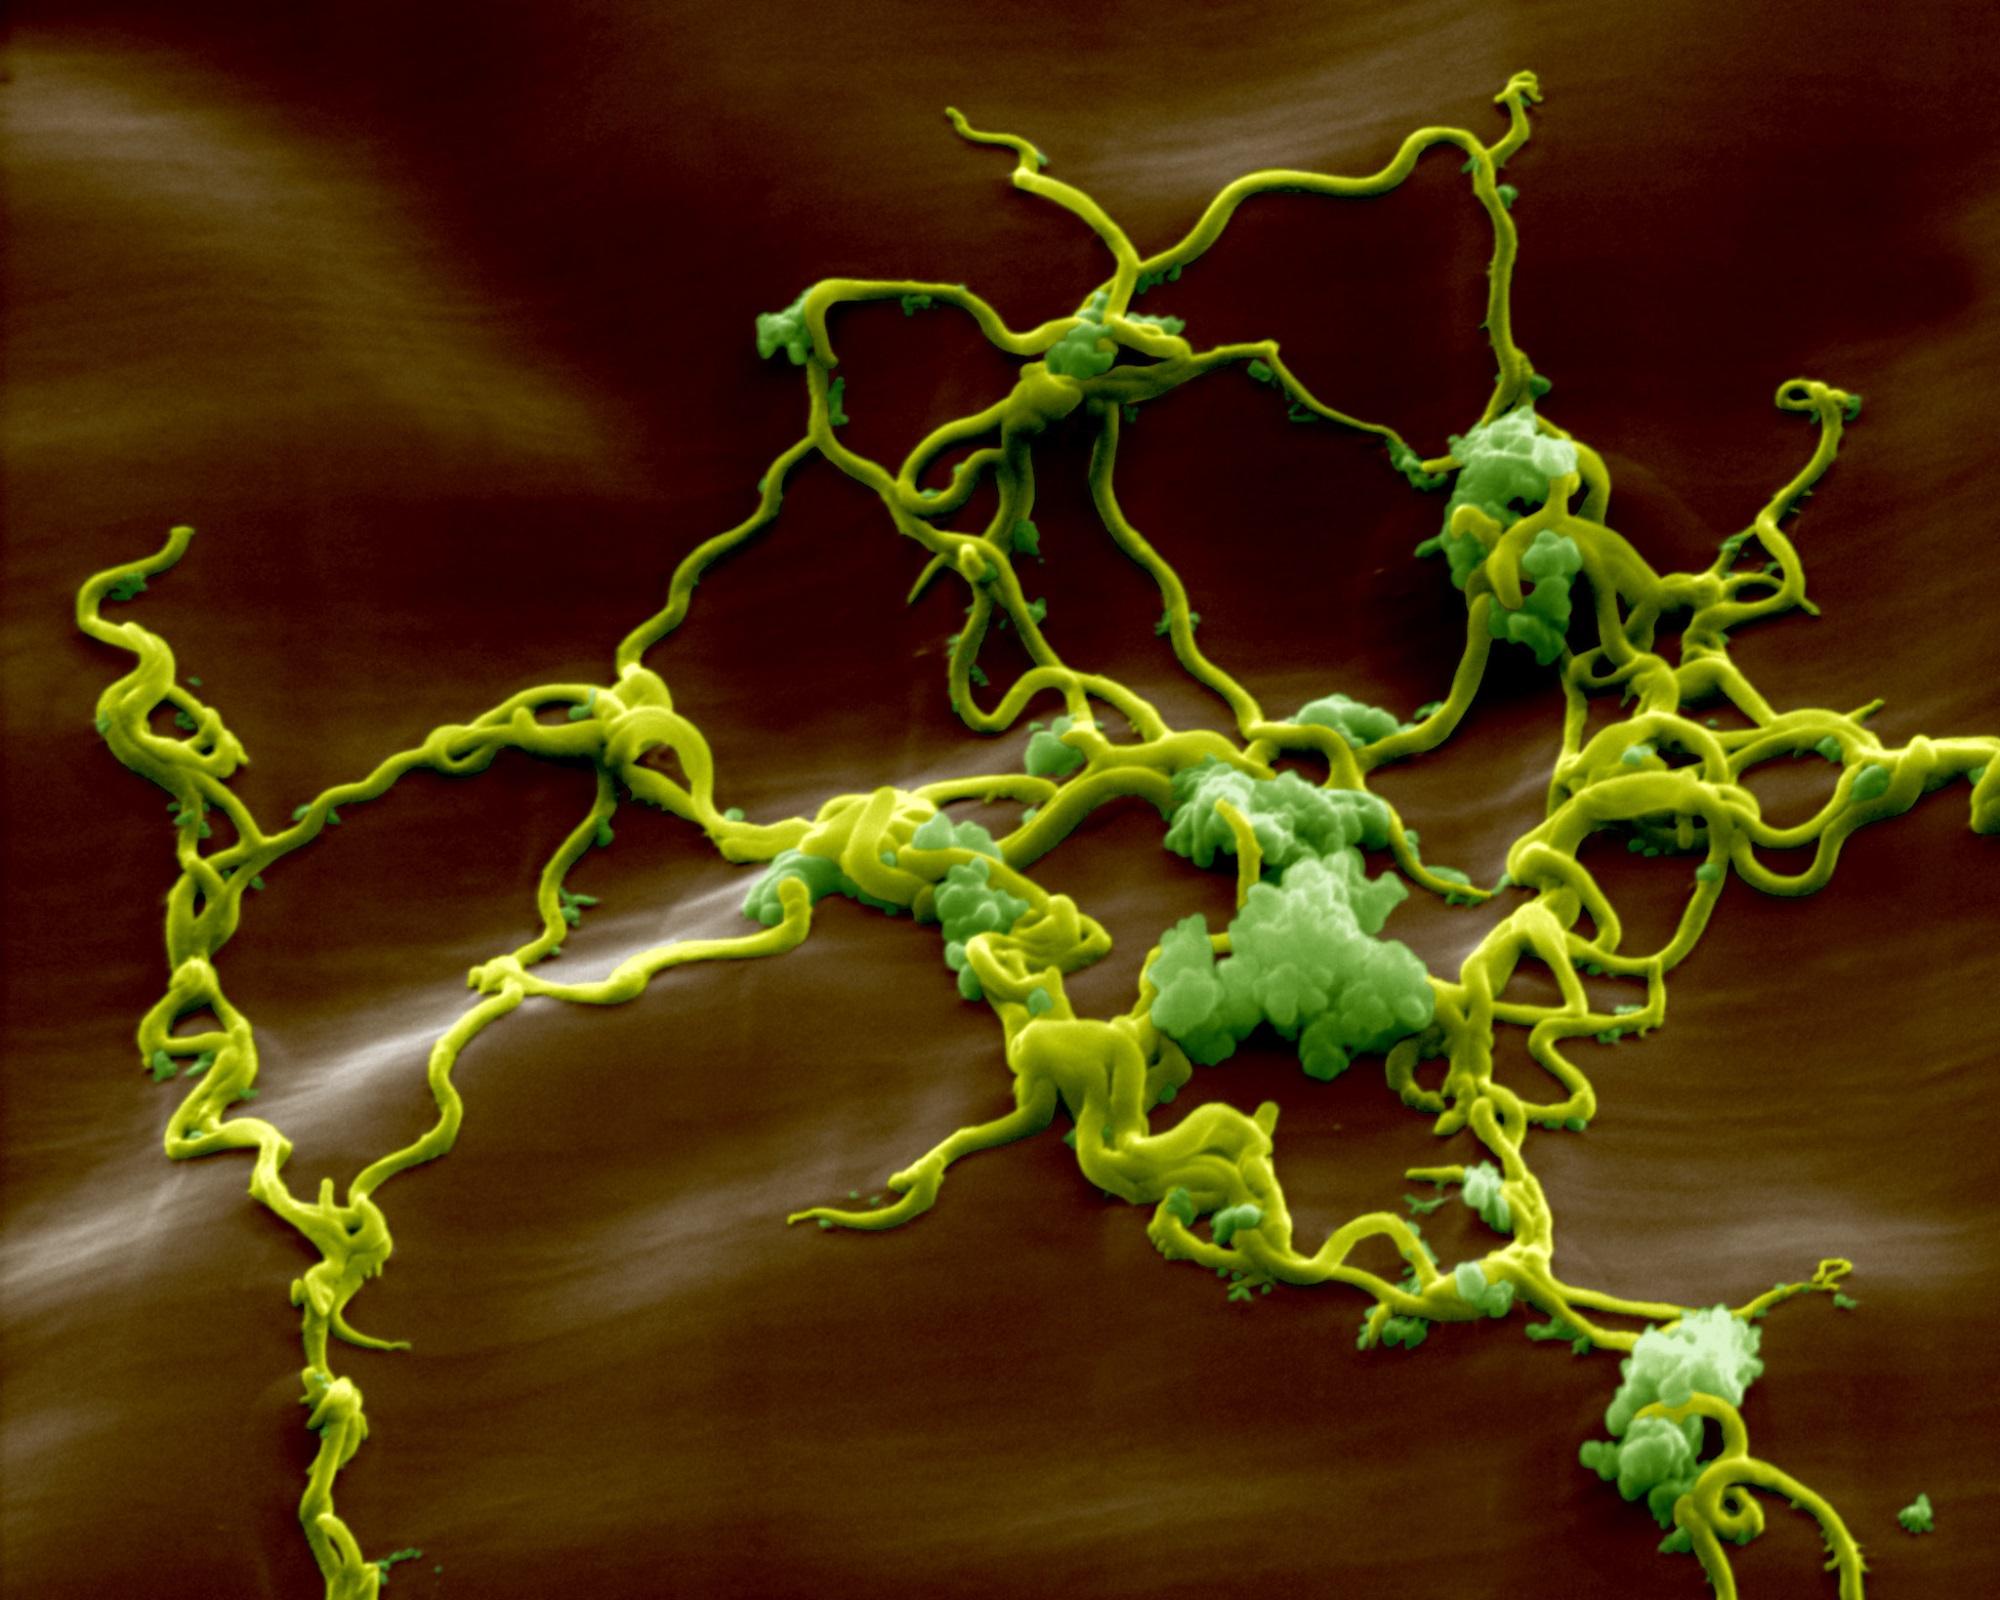 Diagnosing Lyme Disease in Children With Neuropsychiatric